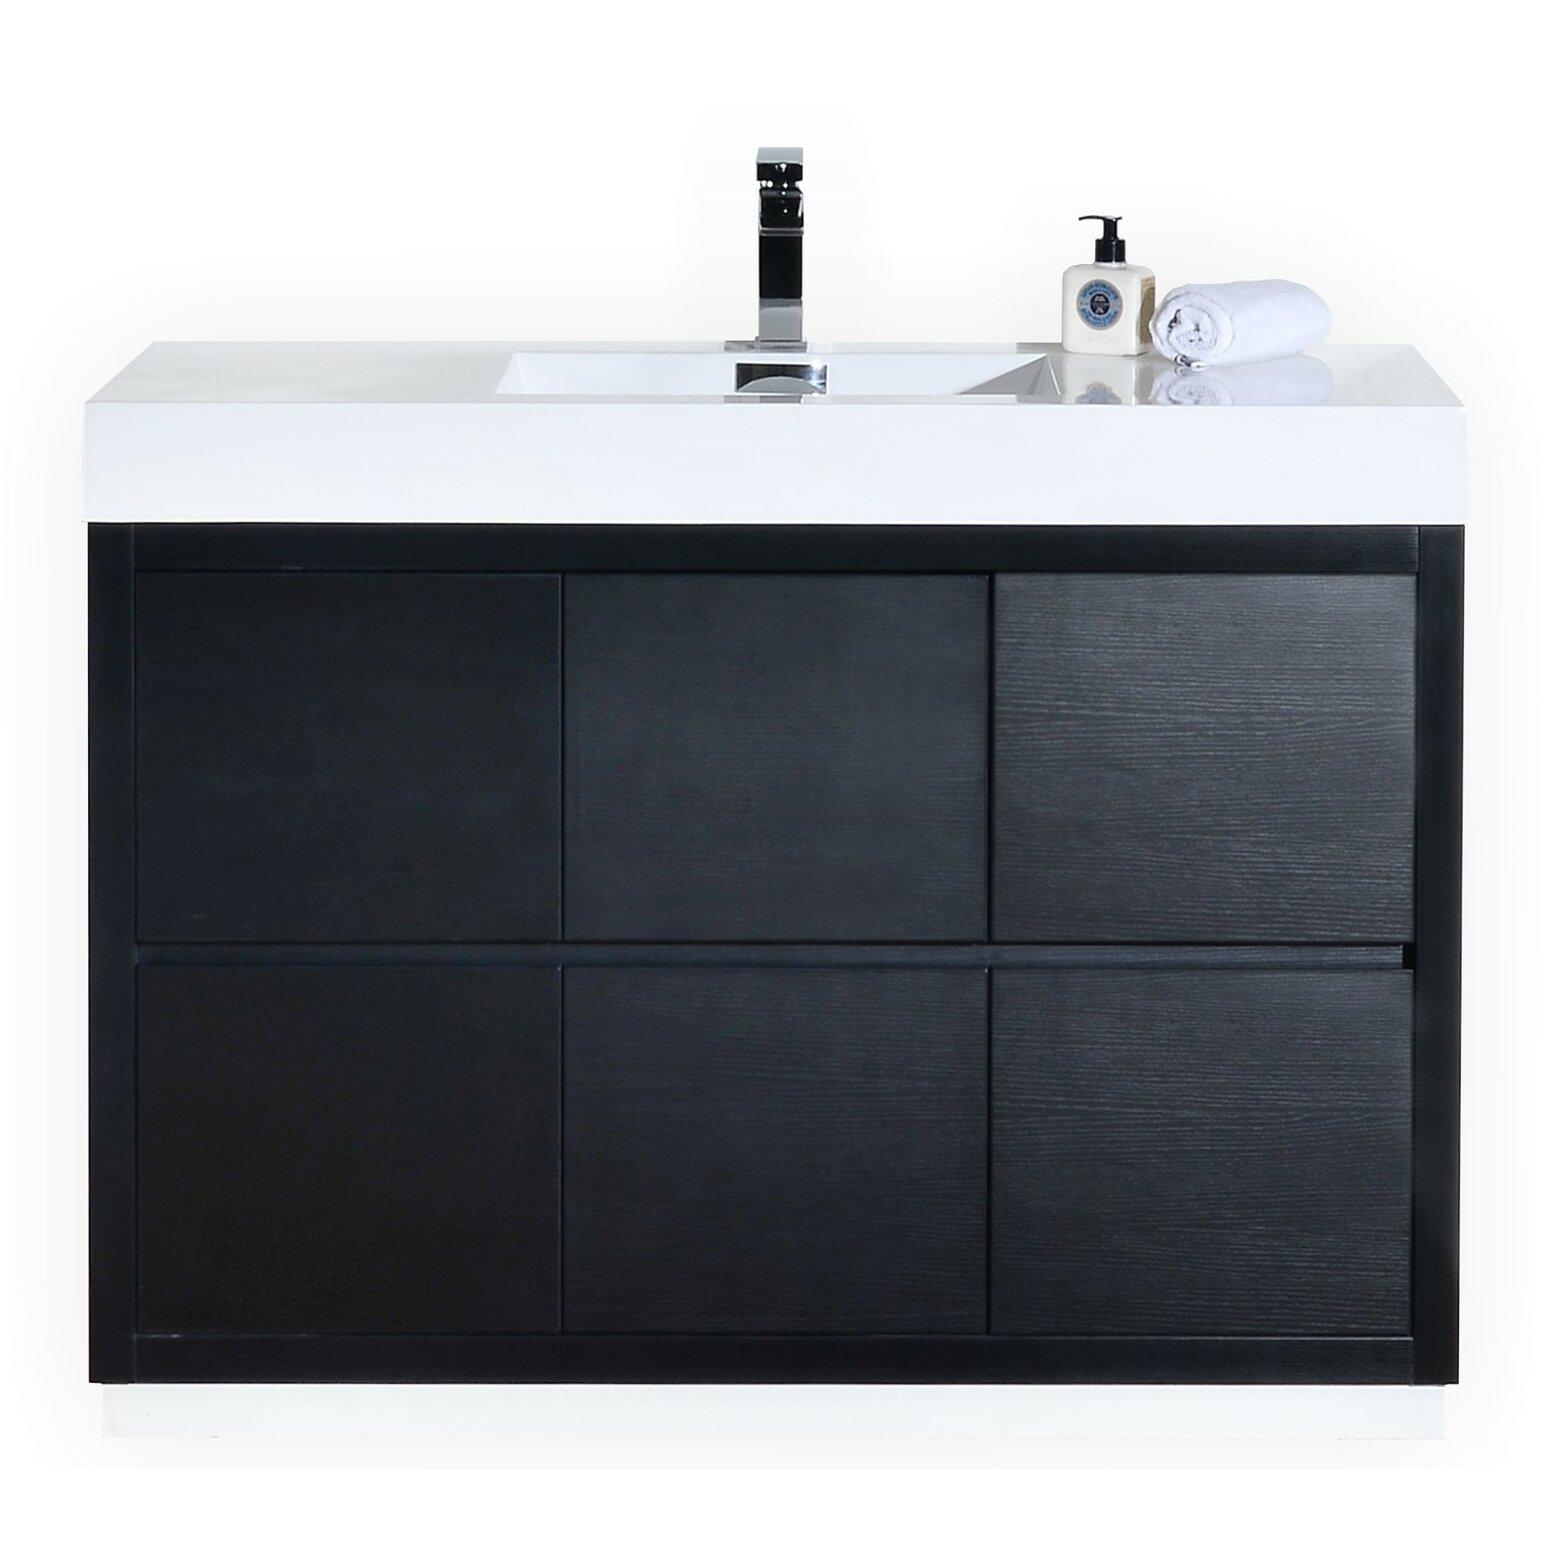 Kube Bath Bliss 48 amp quot  Single Free Standing Modern Bathroom Vanity Set. Bliss 48 quot  Single Free Standing Modern Bathroom Vanity Set